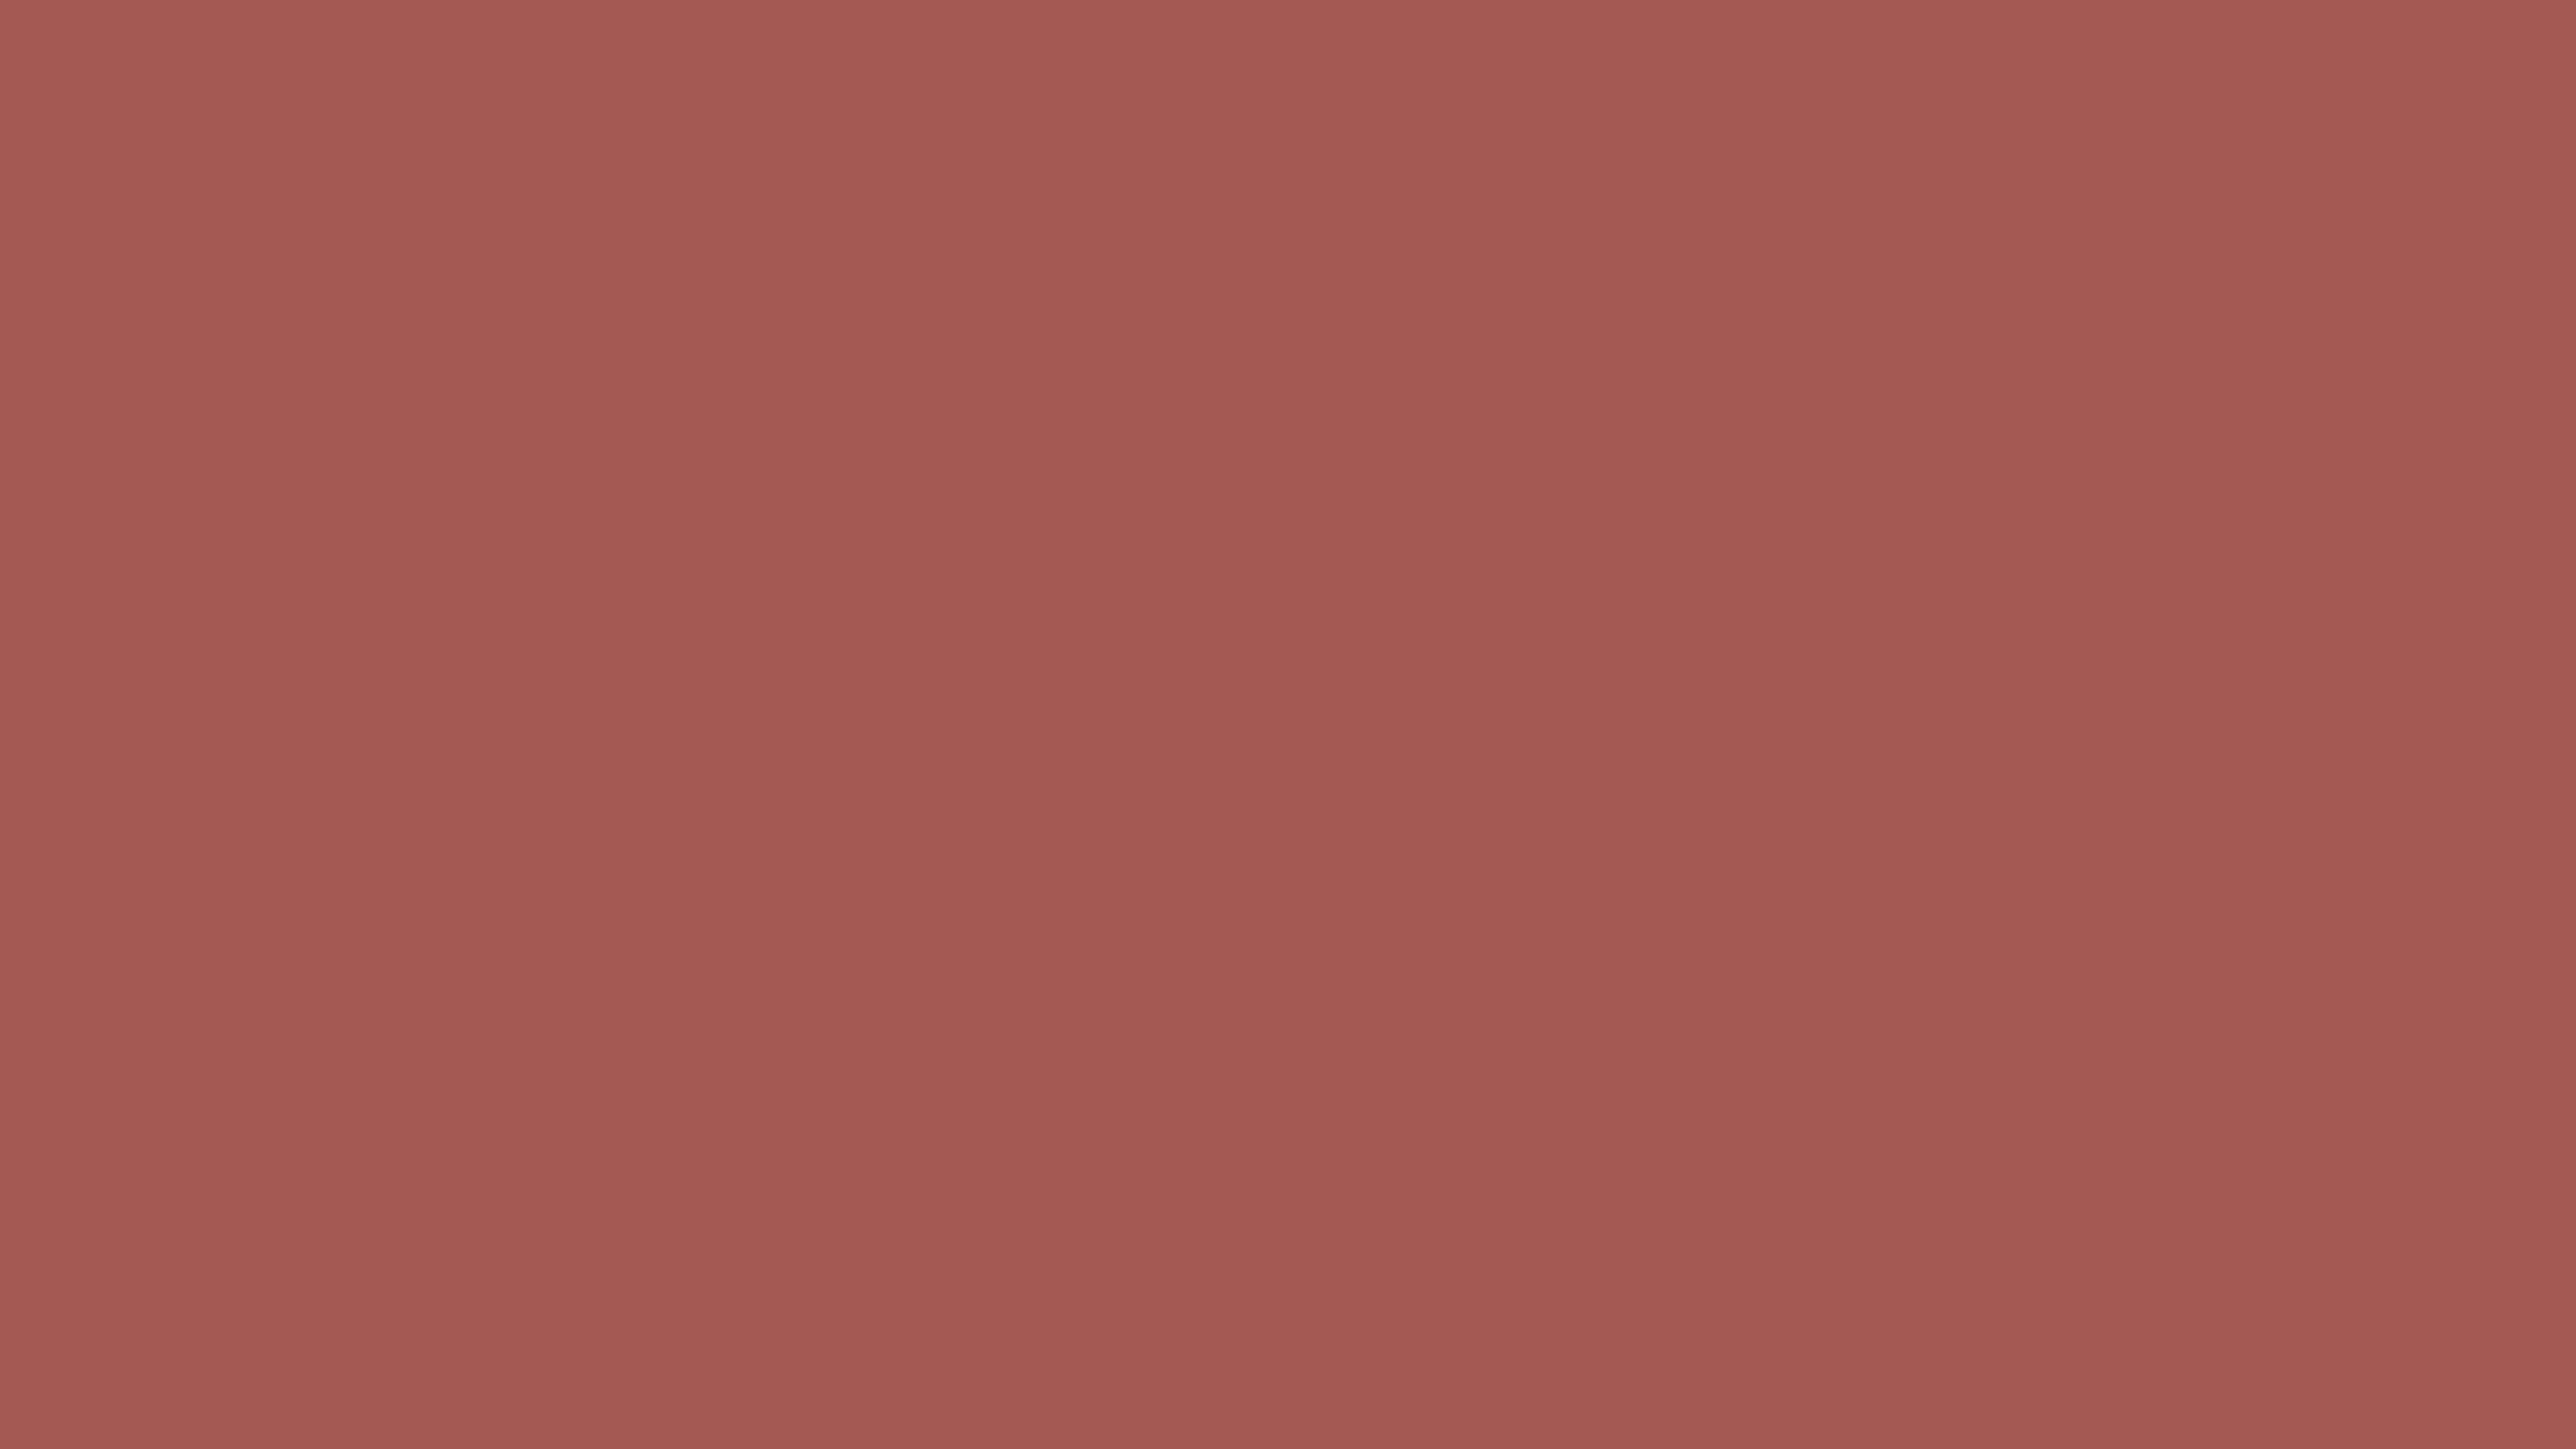 5120x2880 Redwood Solid Color Background